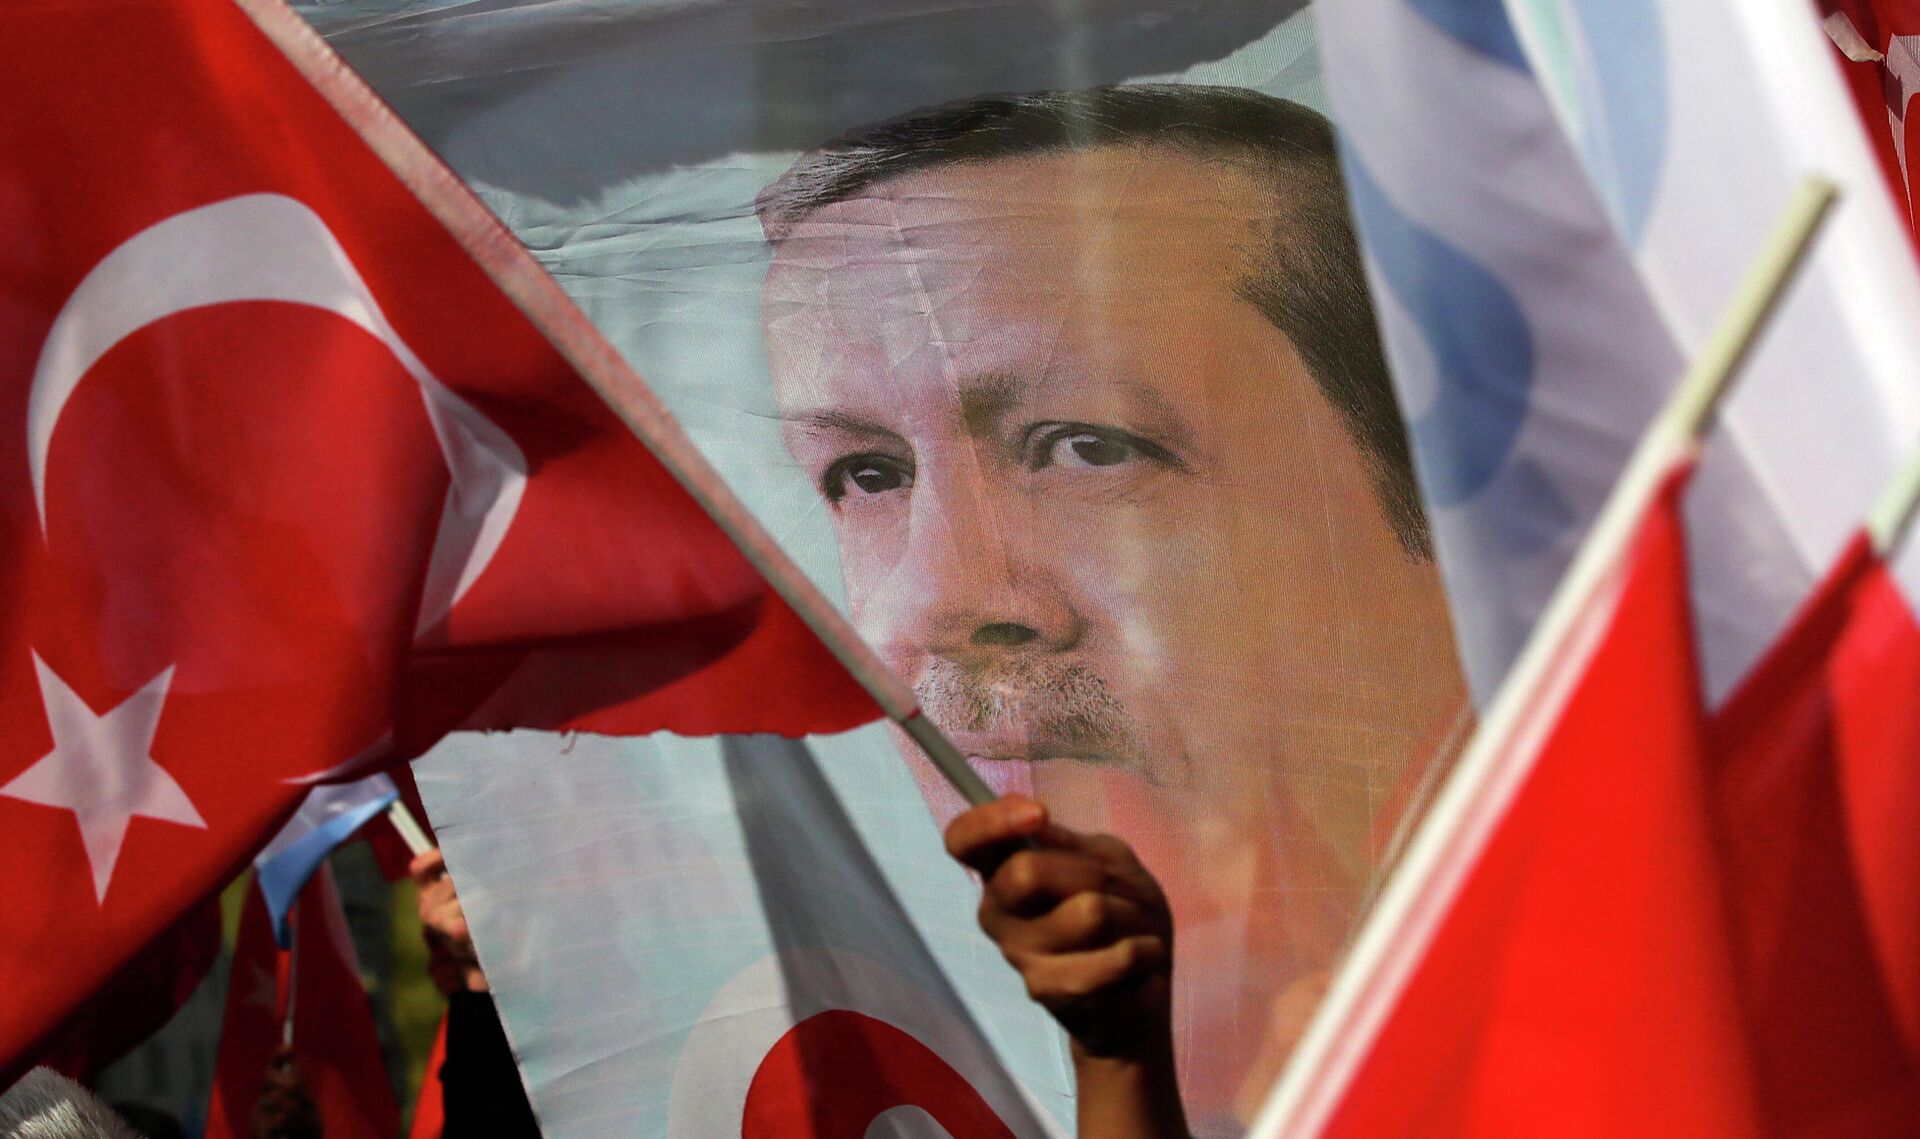 Сторонники президента Турции Реджепа Тайипа Эрдогана с флагами и транспарантами  - РИА Новости, 1920, 15.07.2021